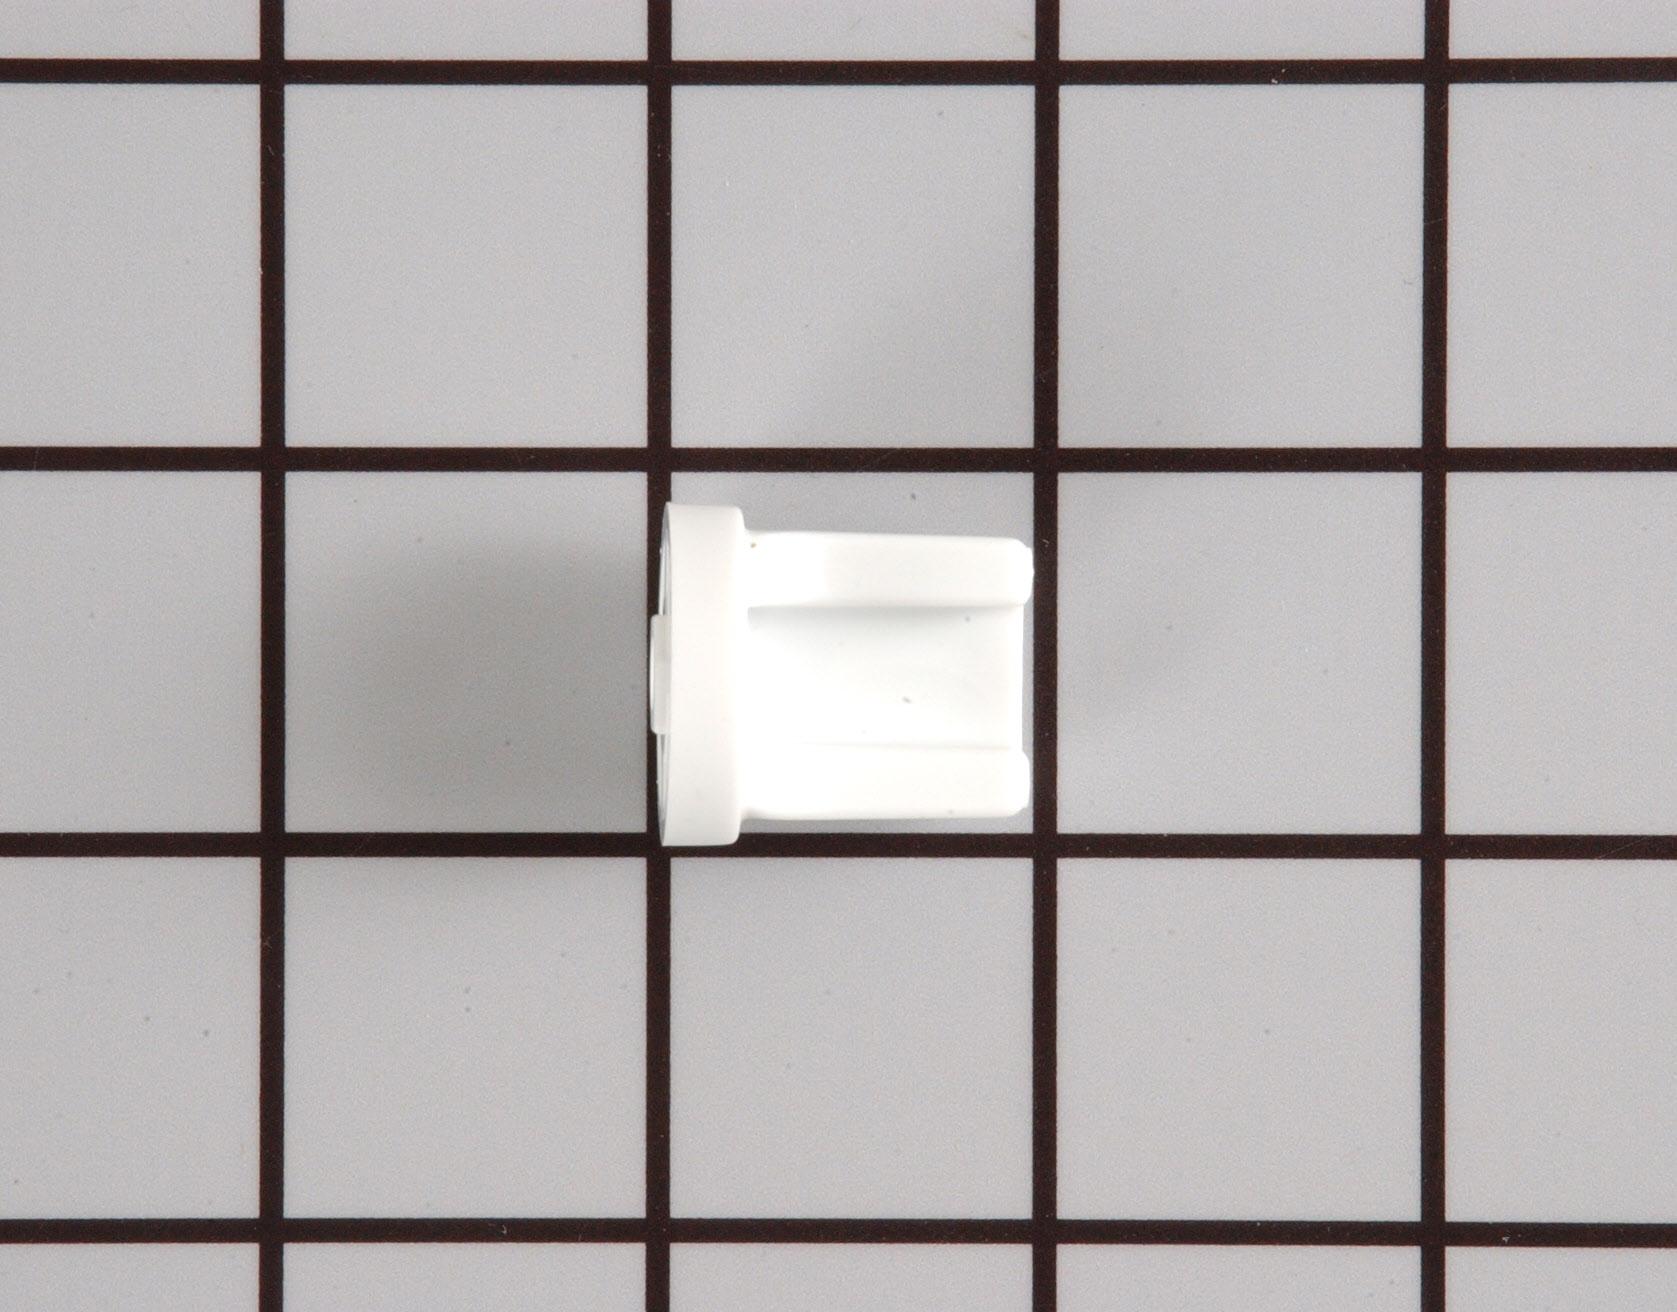 Amana Refrigerator Part # WP2196207 - Shelf Support